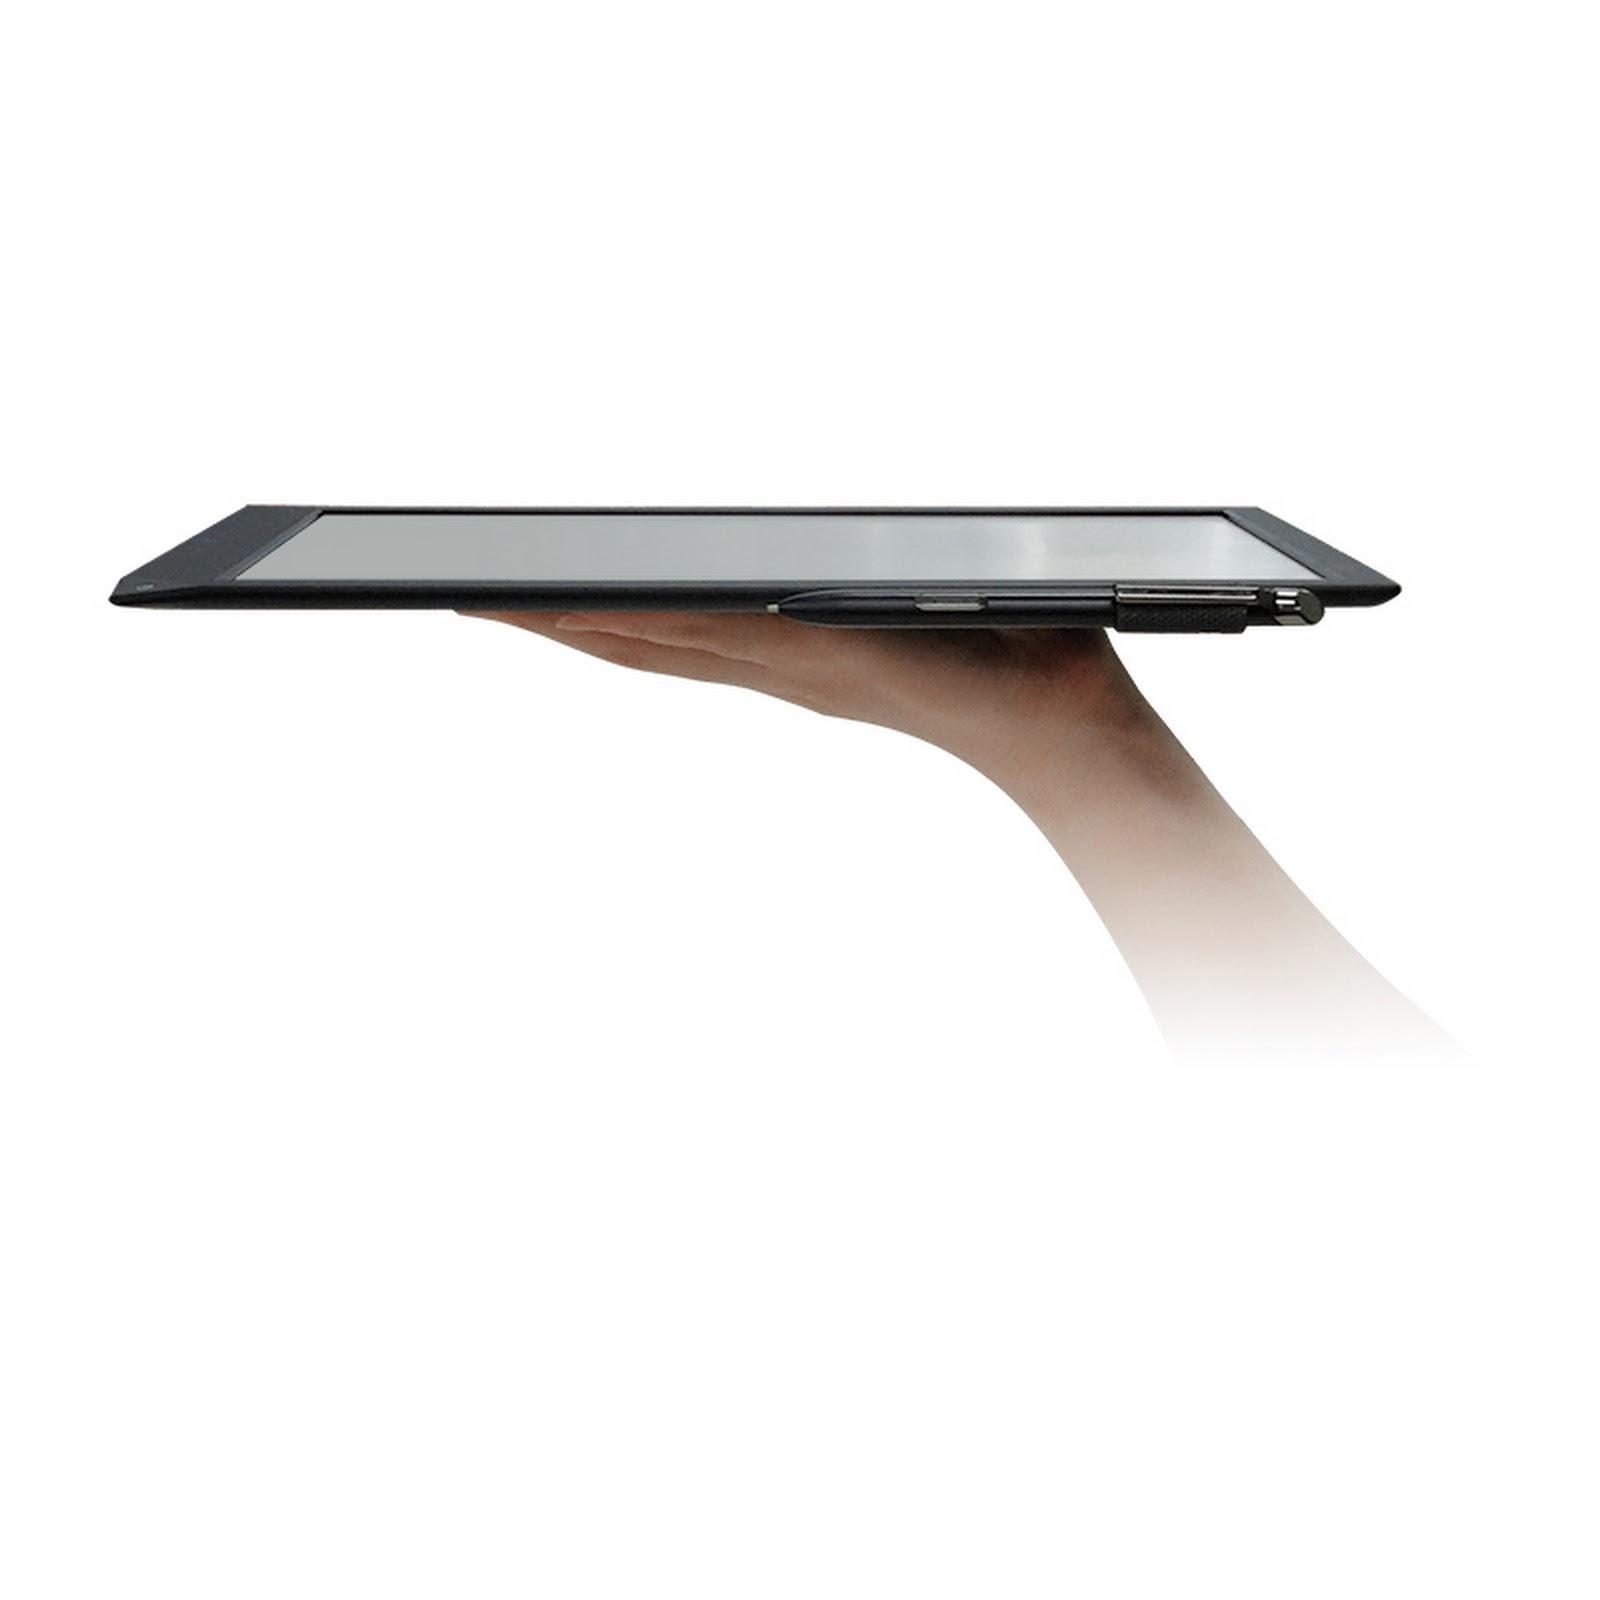 Sony DPT S1 tamaño A4